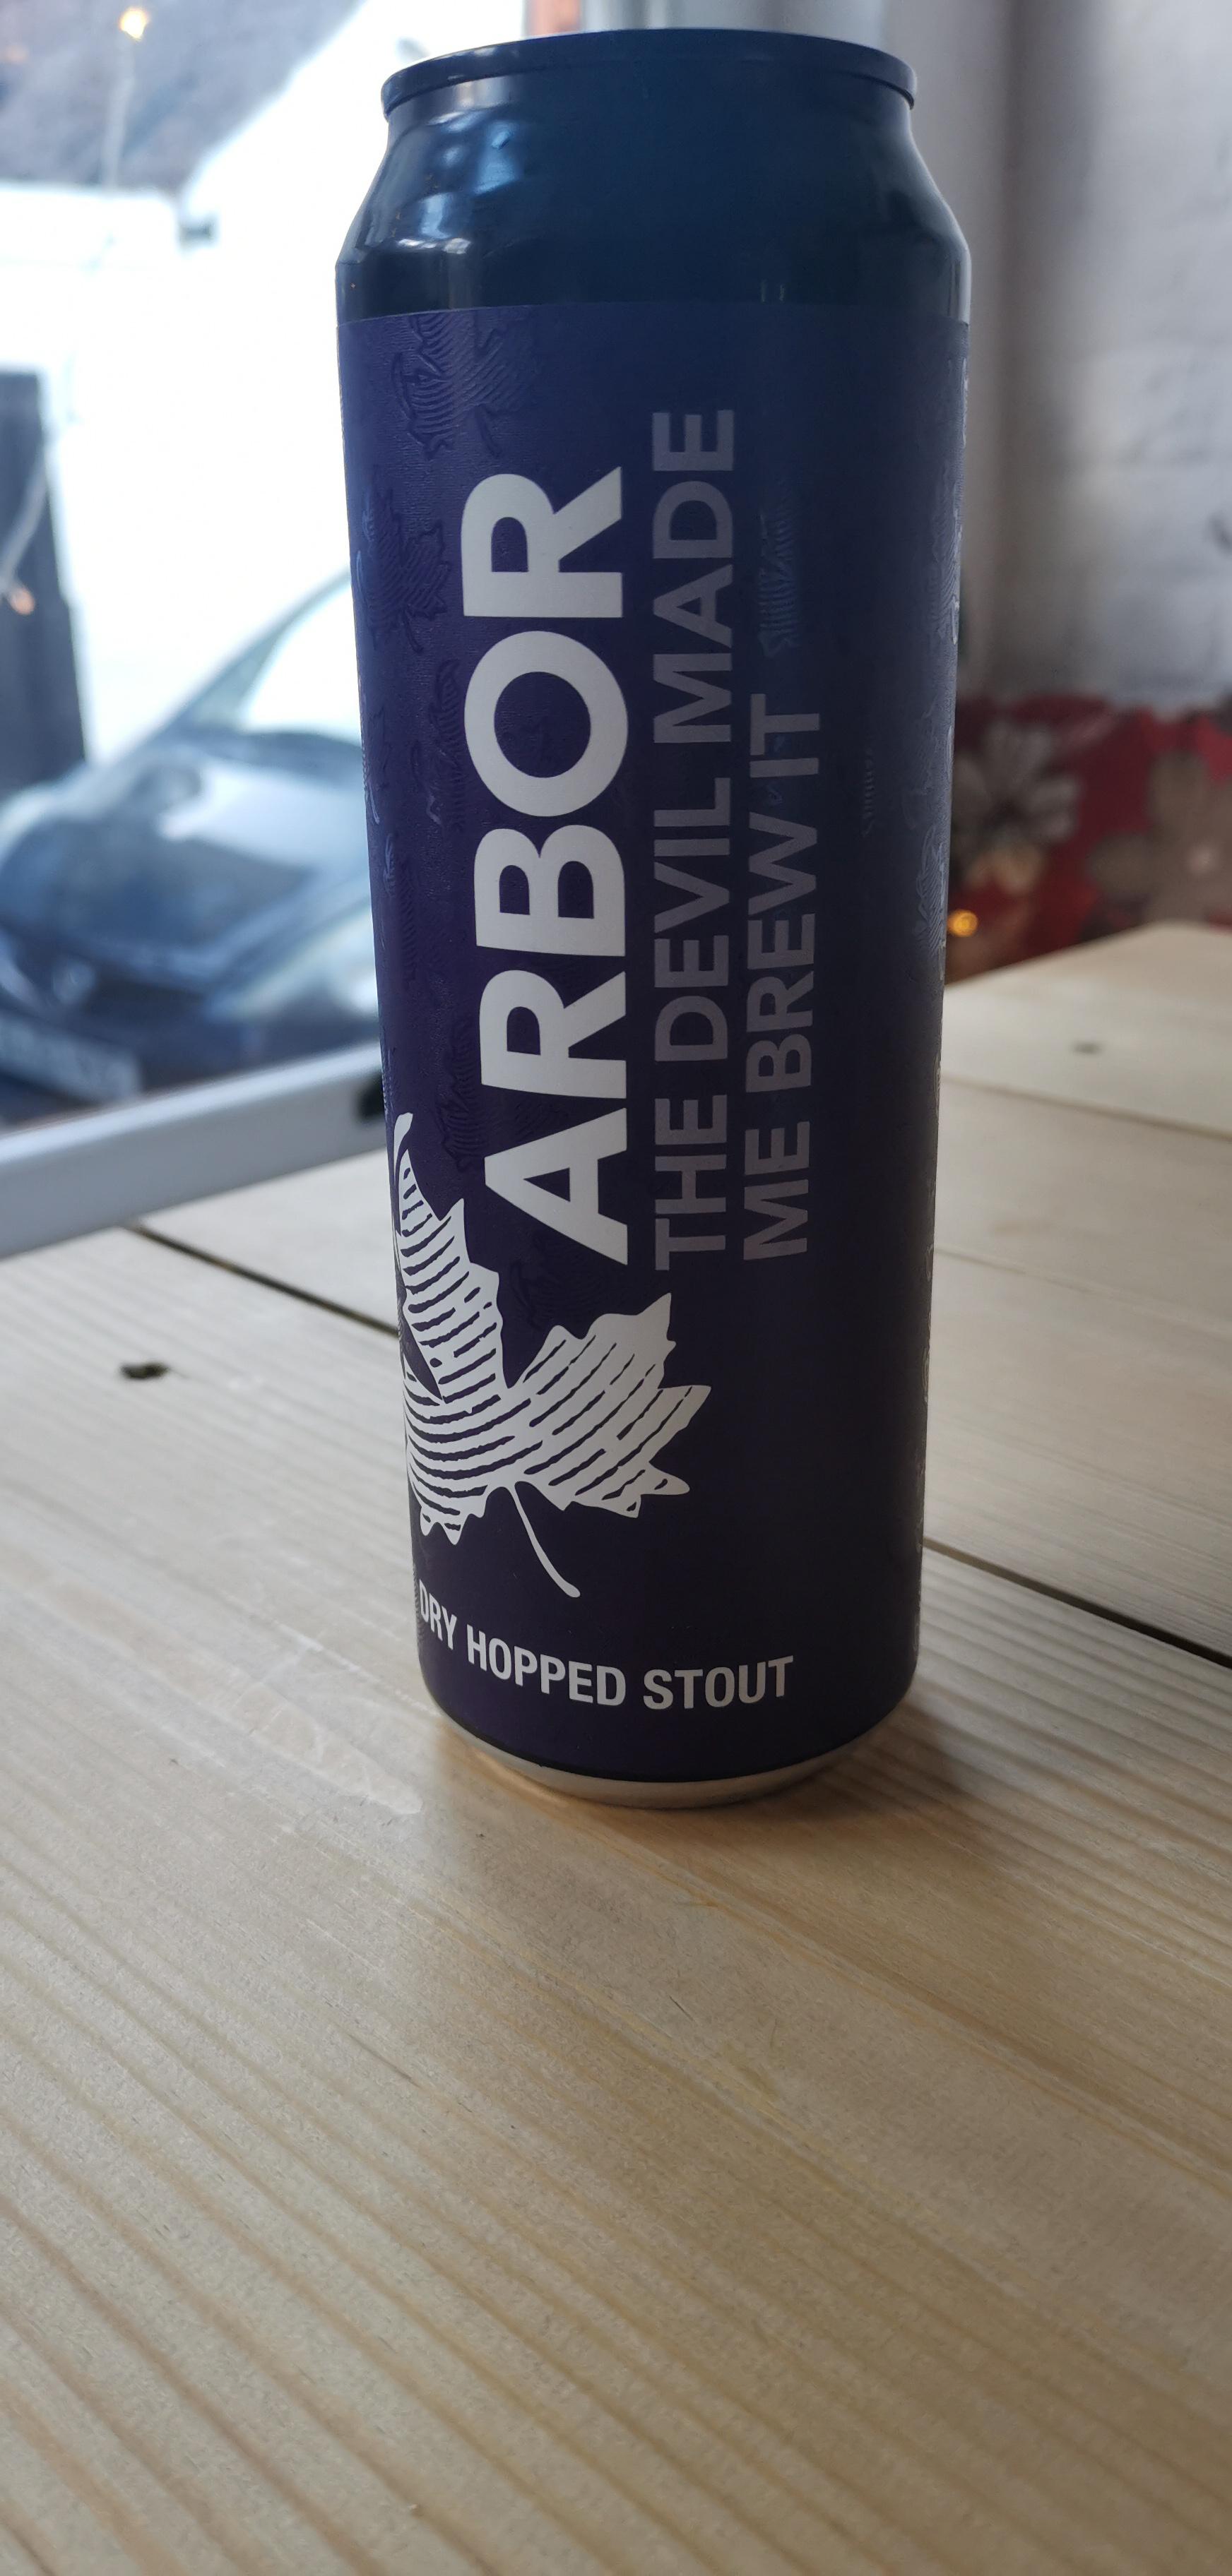 Arbor Ales - The Devil Made Me Brew It (5.5% Dry Hopped Stout)